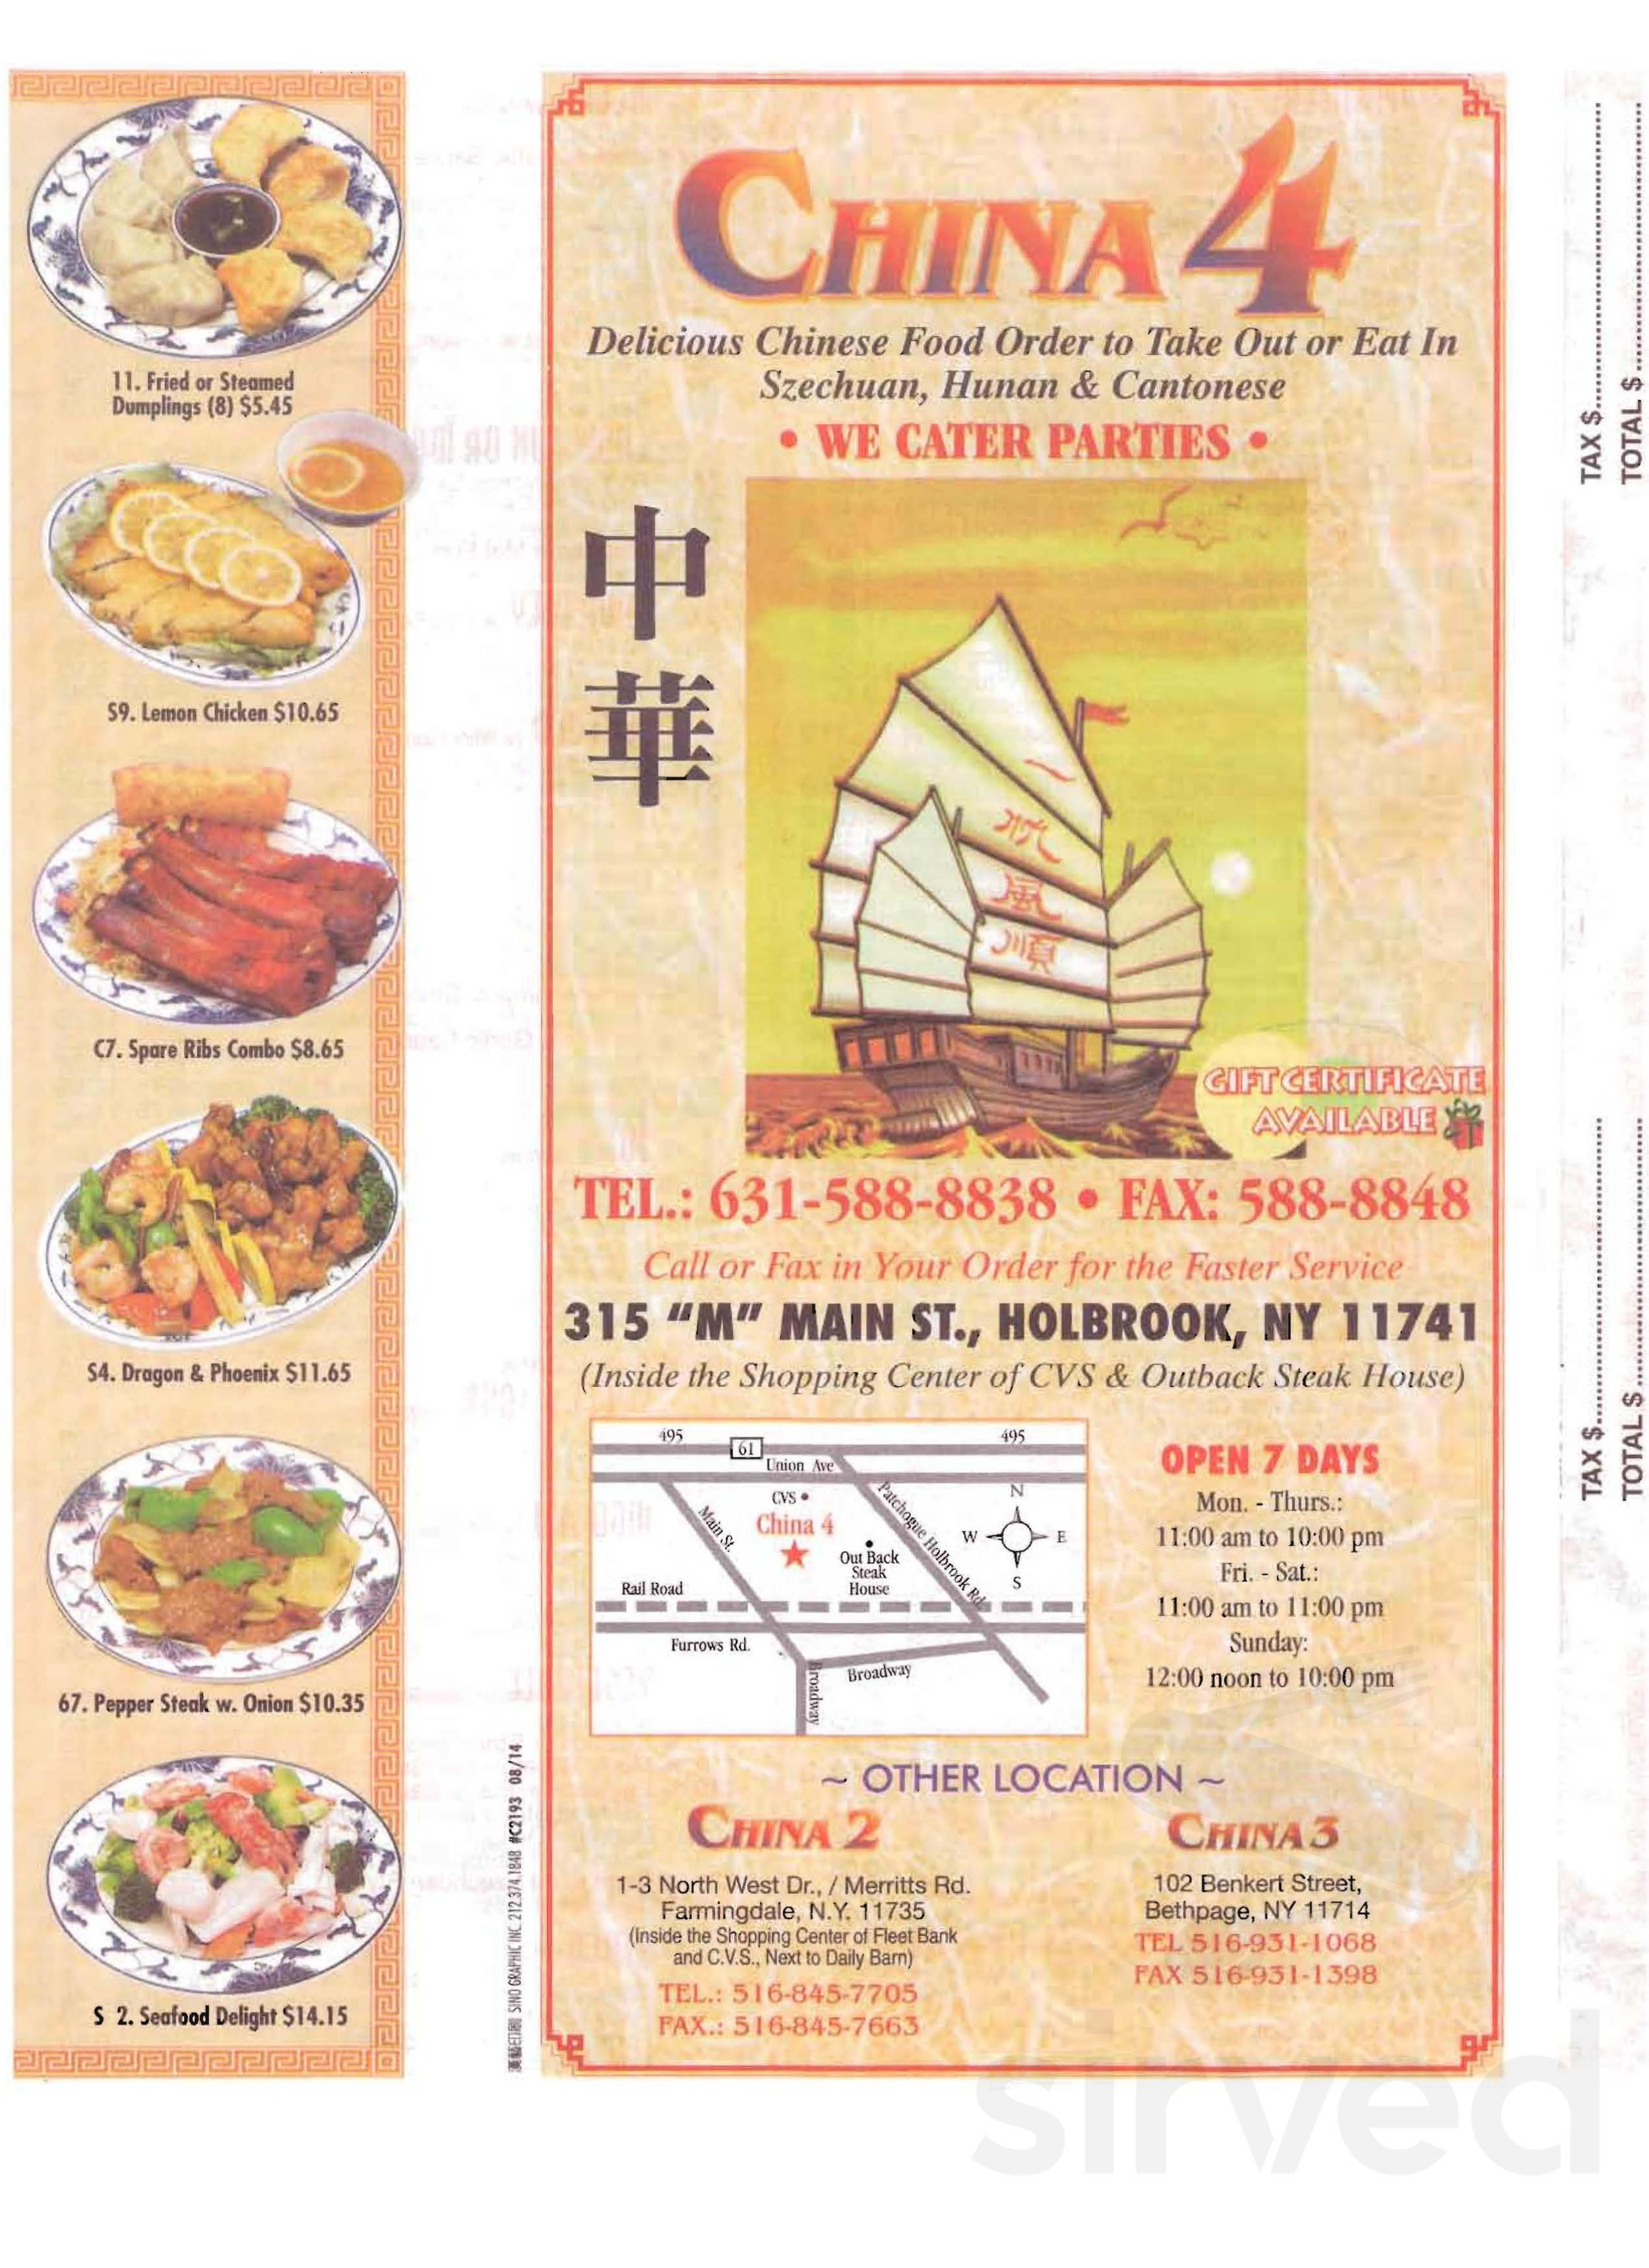 China 4 Menu In Holbrook New York Usa